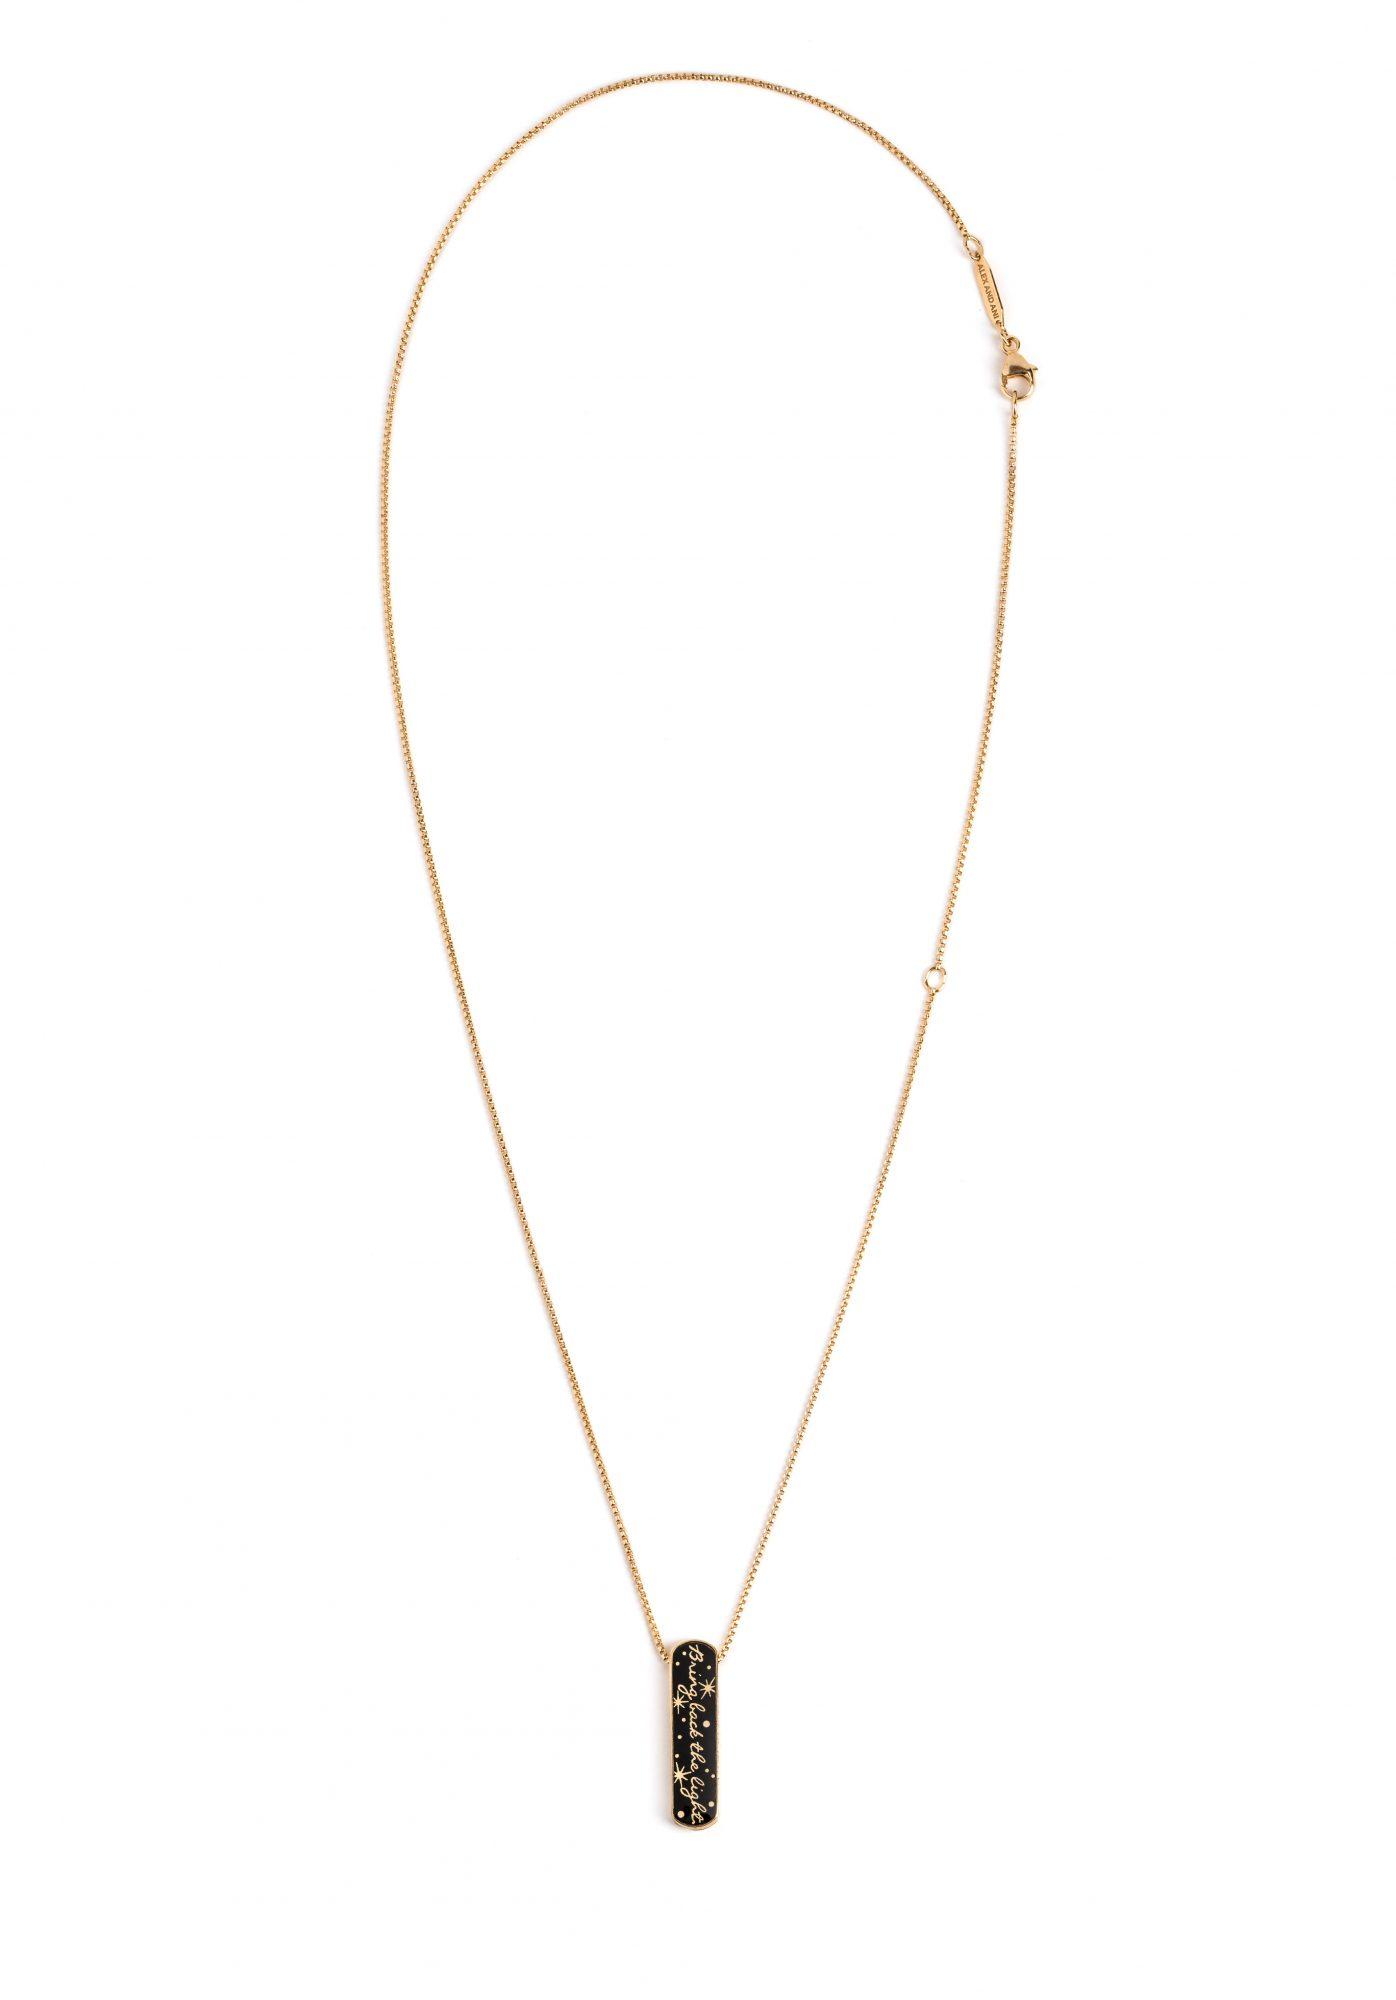 awir-bring-light-necklace.jpg